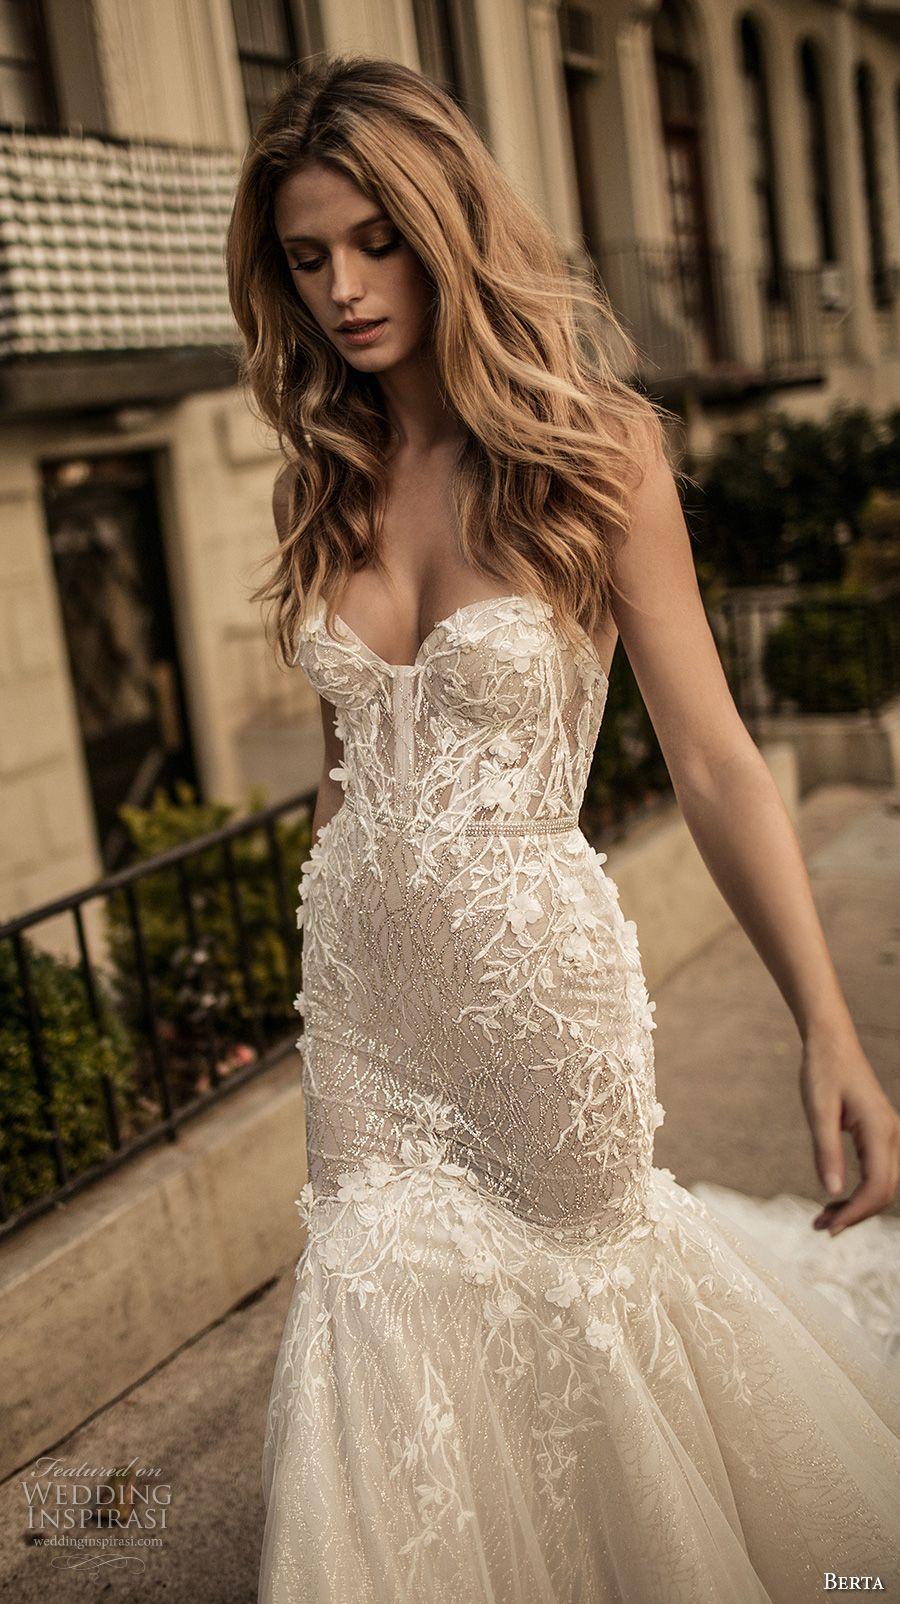 Berta Fall 2017 Wedding Dresses Wedding Inspirasi Bridal Corset Wedding Dresses Wedding Dresses 2017 [ 1604 x 900 Pixel ]